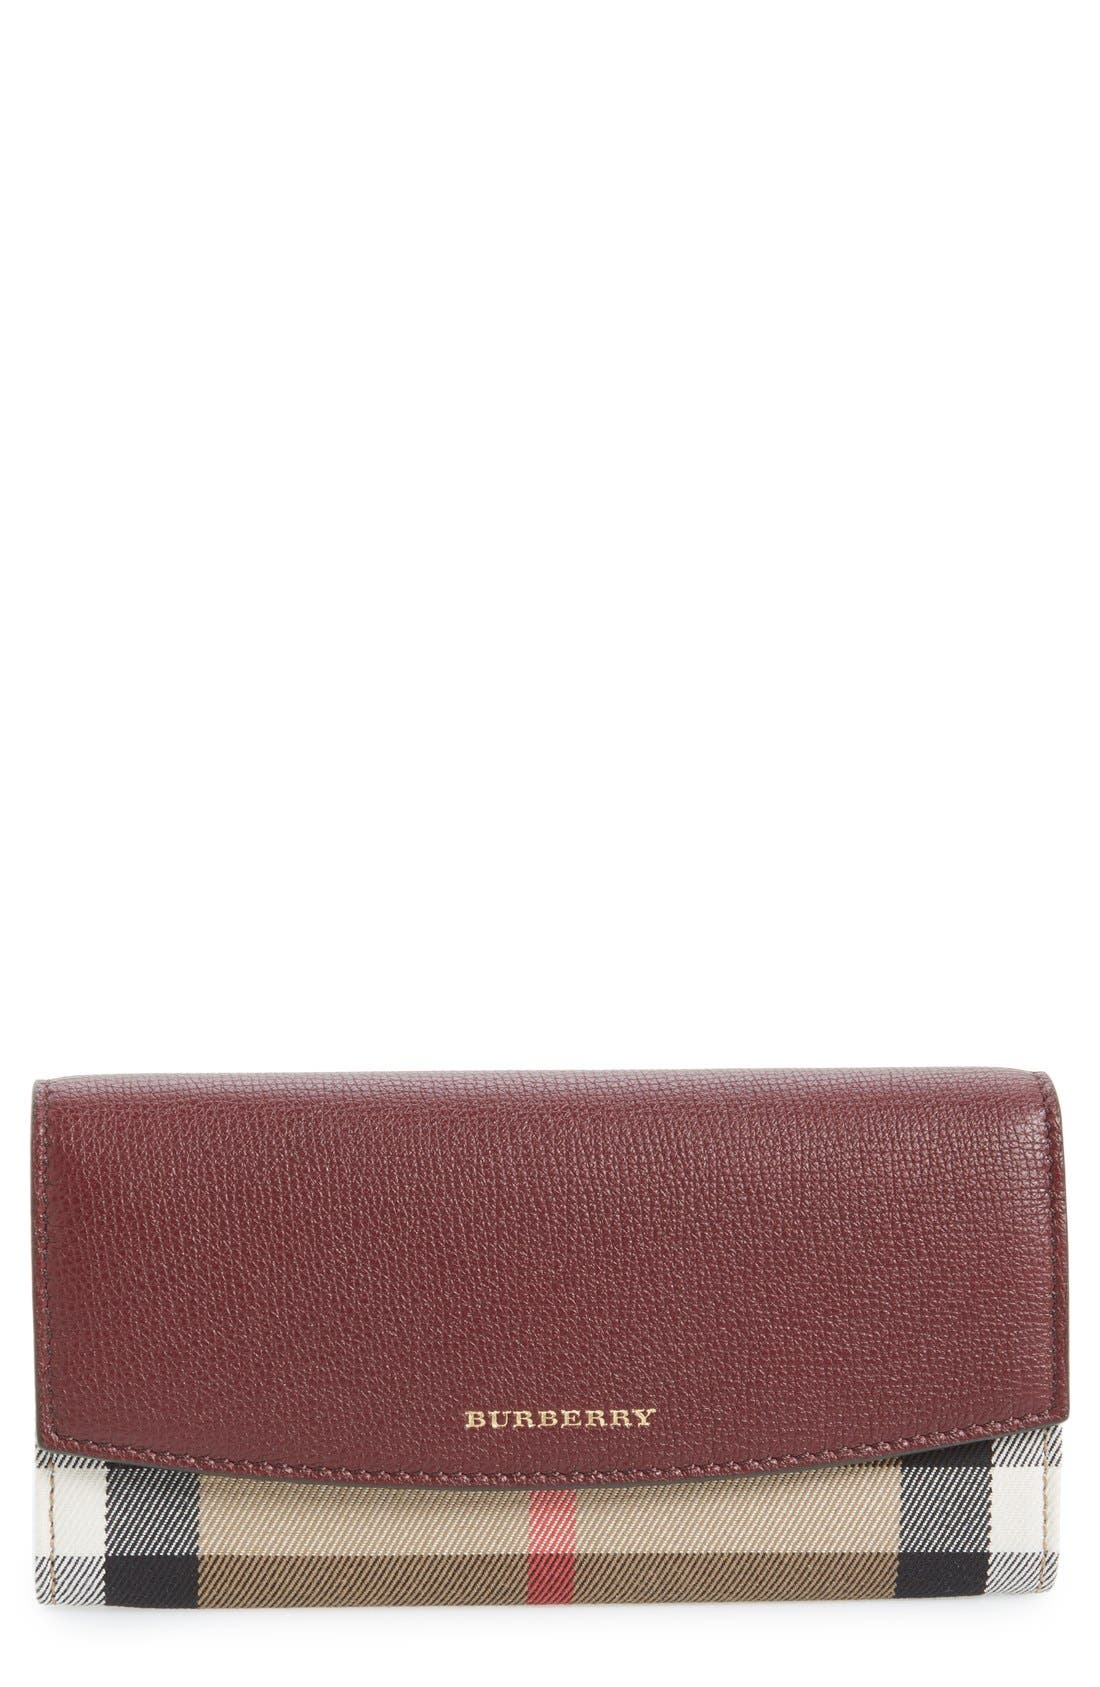 'Porter - Check' Continental Wallet,                             Main thumbnail 1, color,                             600